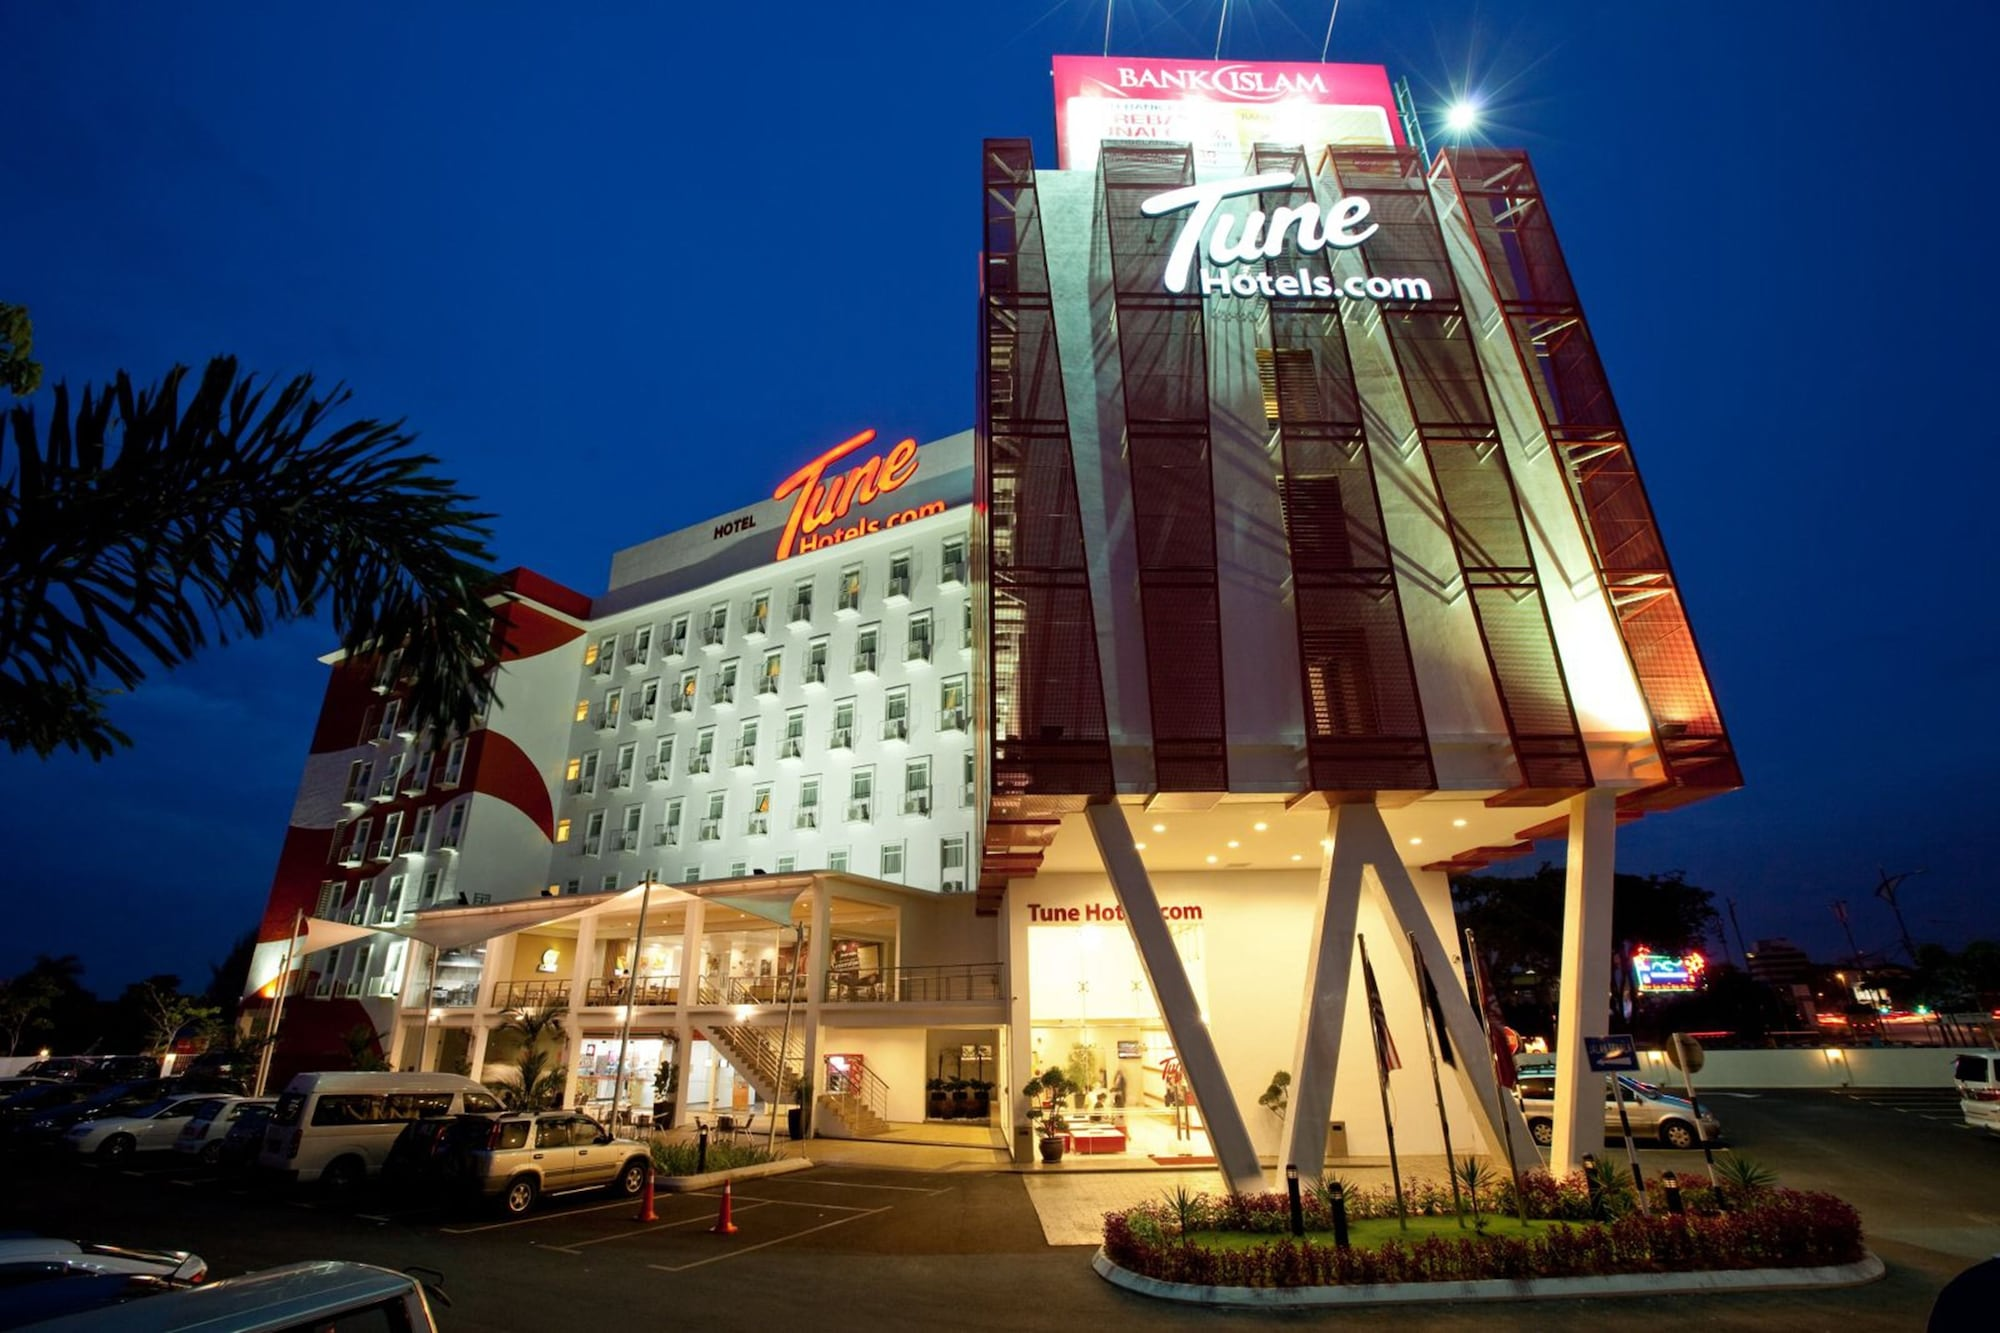 Tune Hotel Danga Bay Johor, Johor Bahru